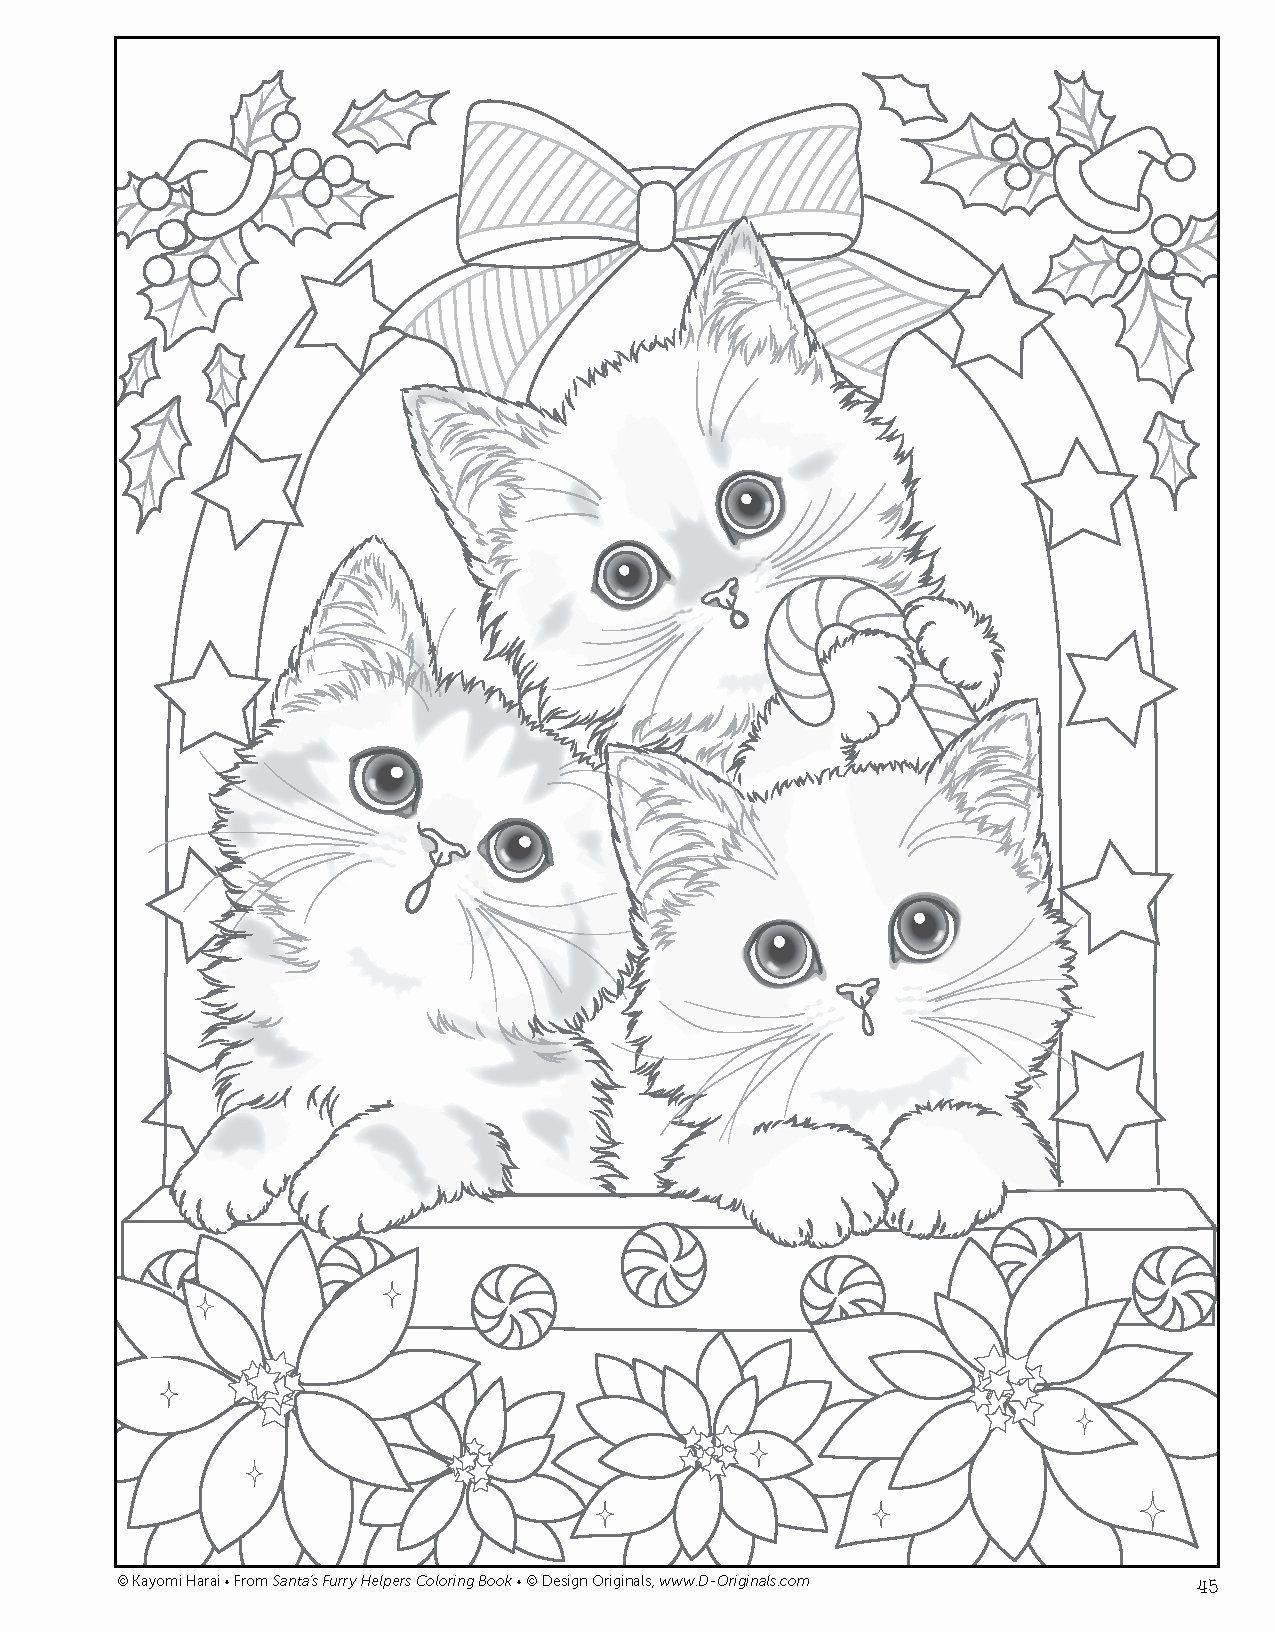 Australian Animals Coloring Book With Images Kolorowanki Rysunki Kolorowanka